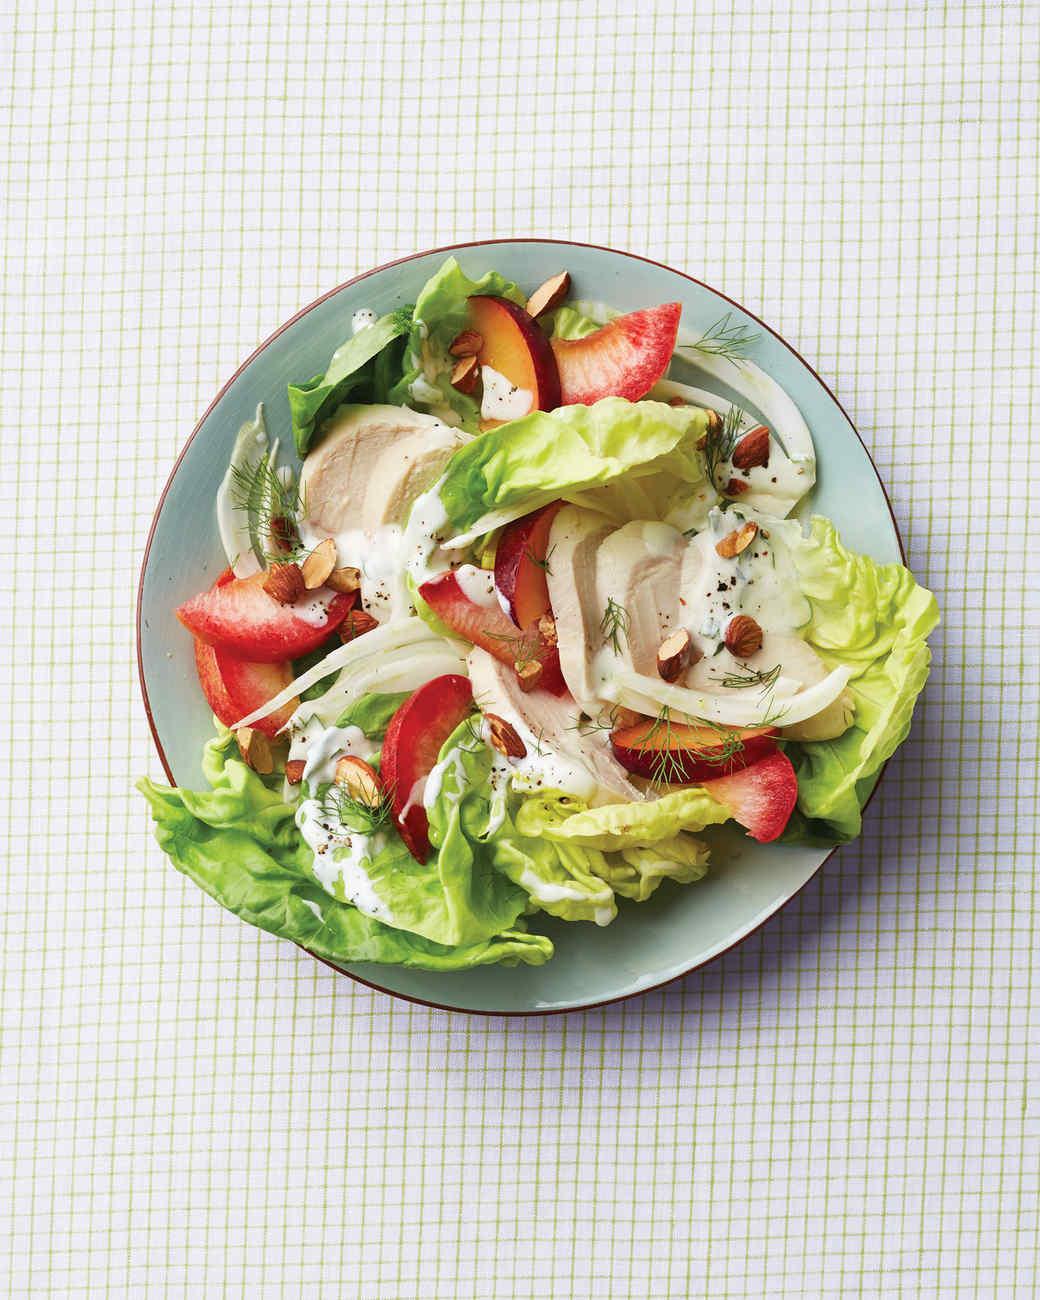 summer-waldorf-salad-107-d112989-2.jpg